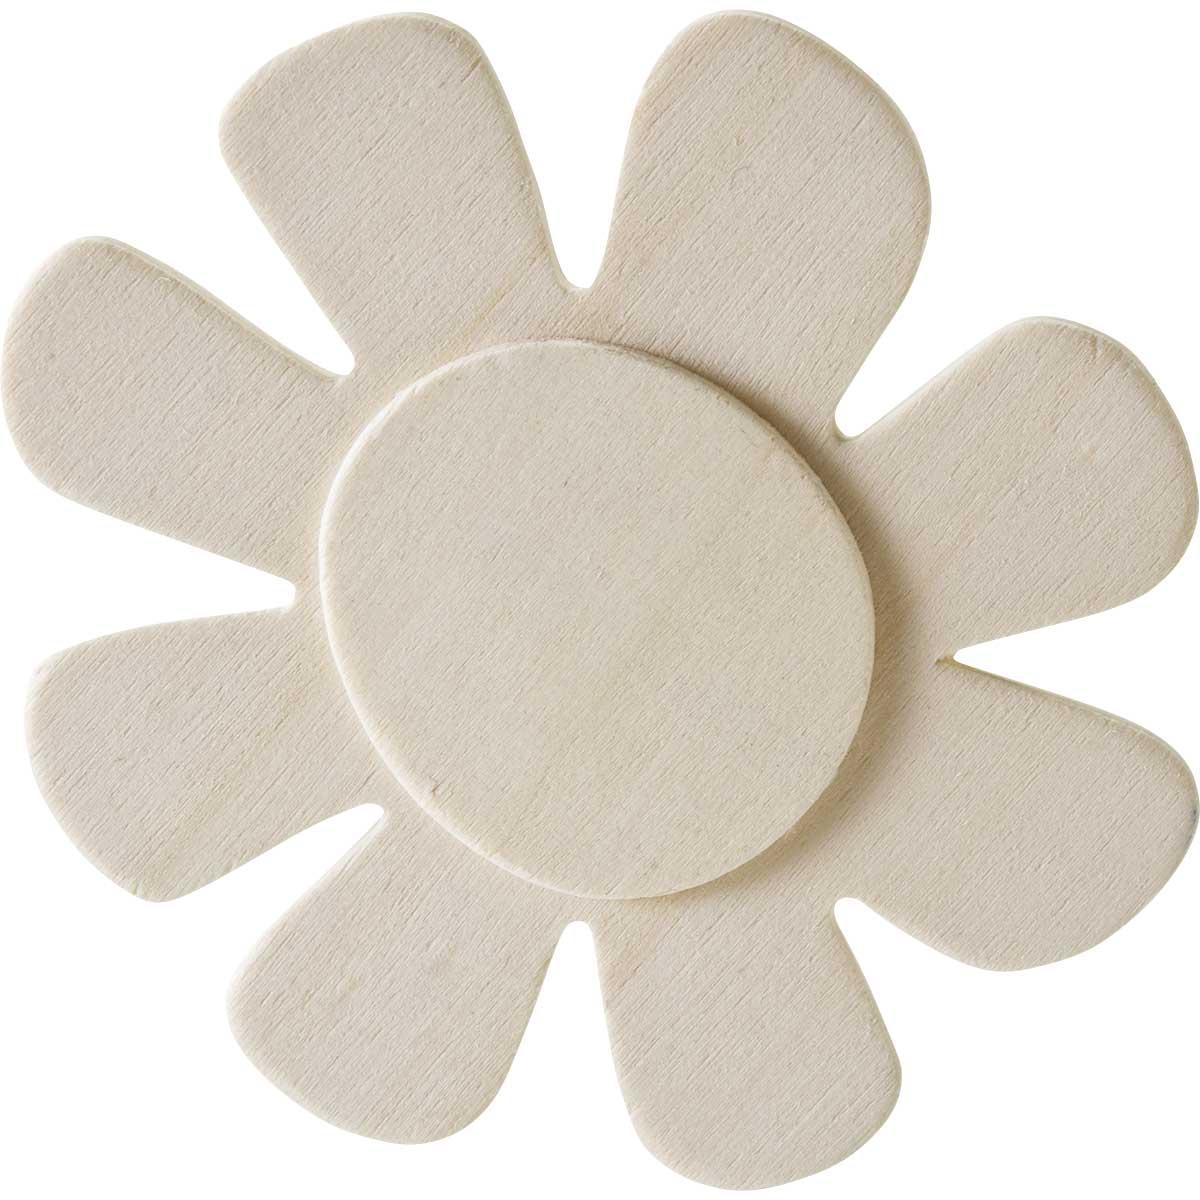 Plaid ® Wood Surfaces - Unpainted Layered Shapes - Flower, 8 Petal - 97092